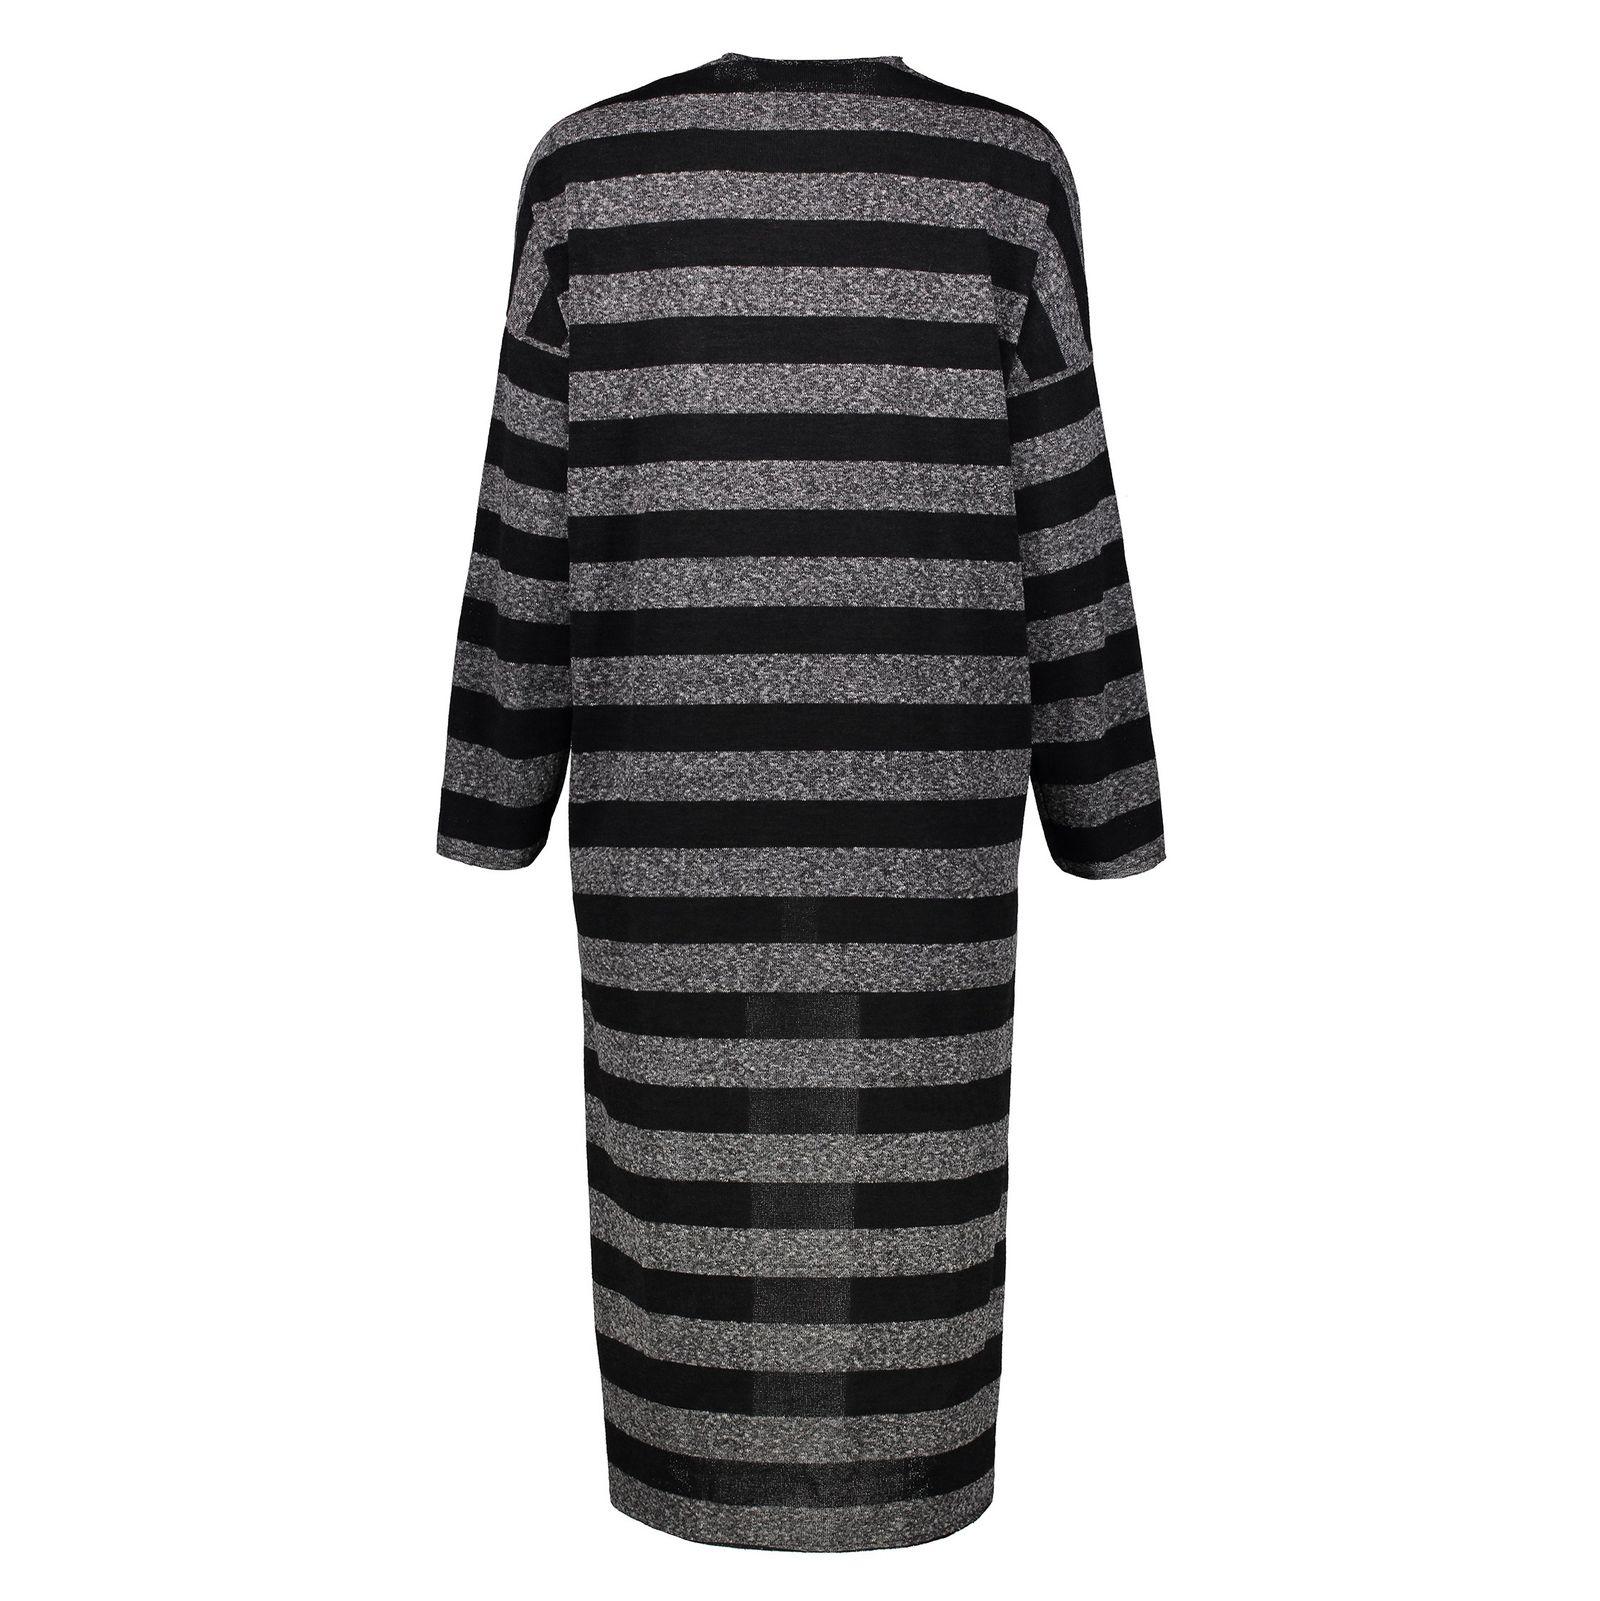 ژاکت بلند زنانه - مانگو - طوسي - 2